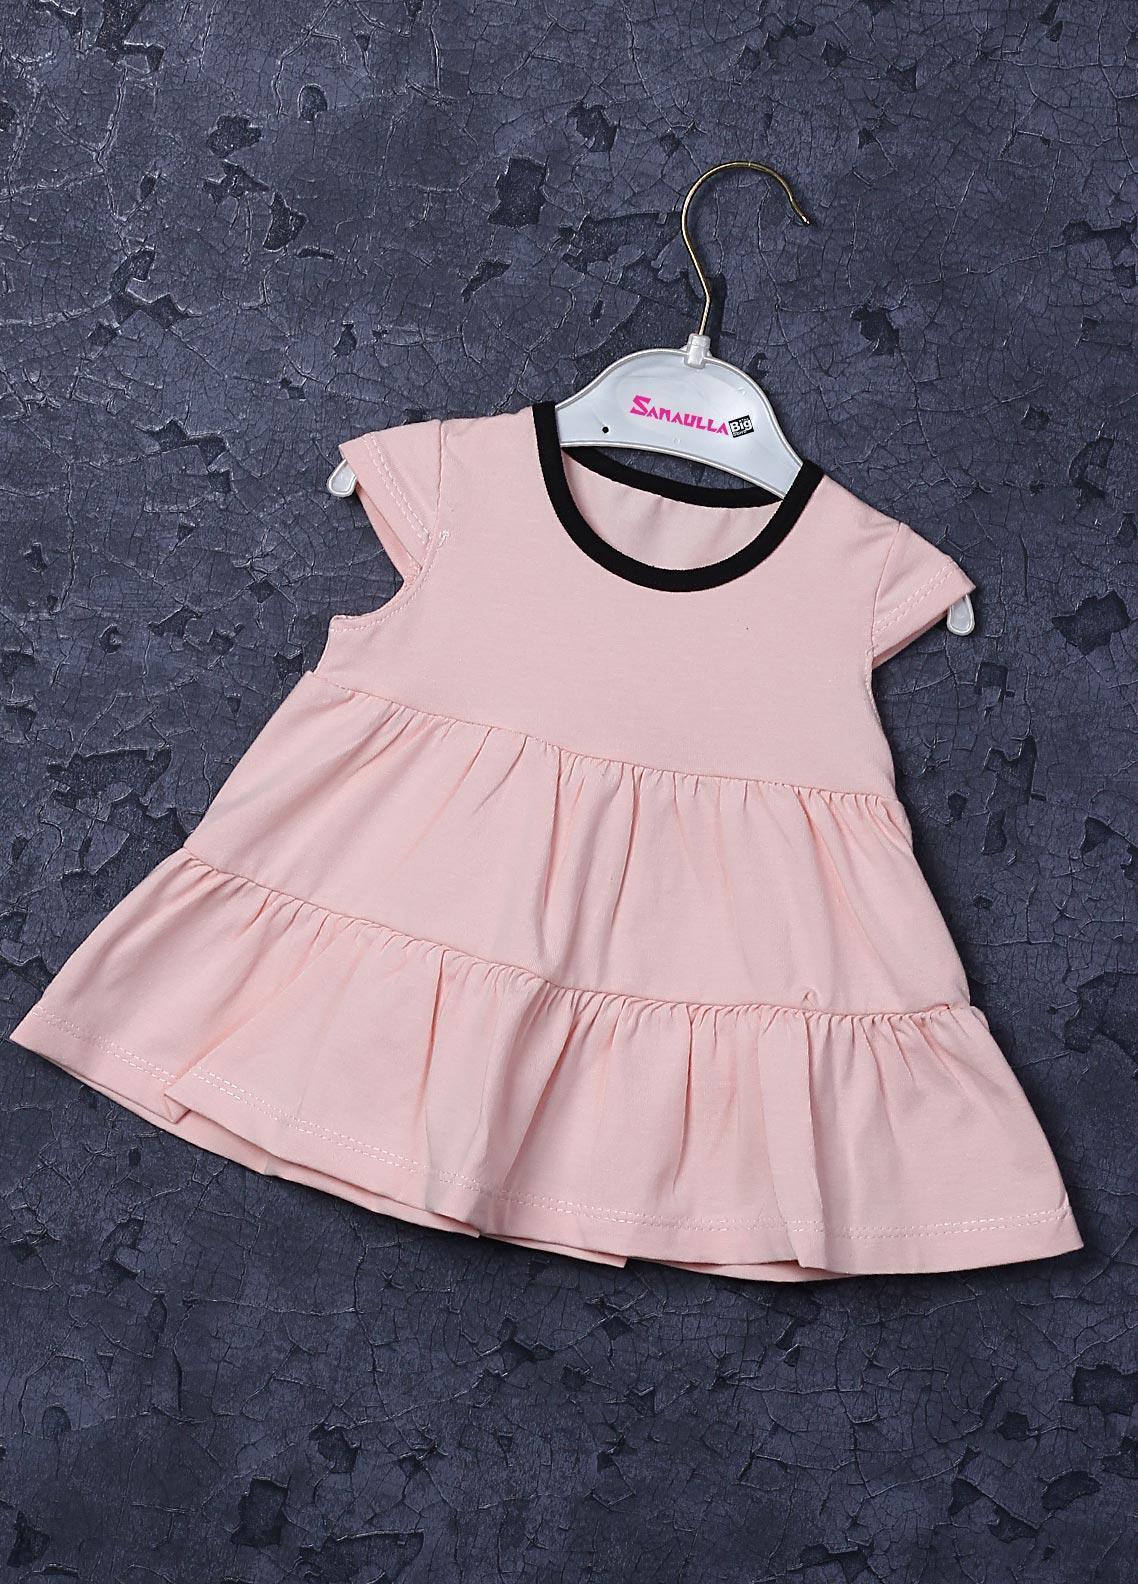 Sanaulla Exclusive Range Cotton Fancy Frocks for Girls -  22553 Pink